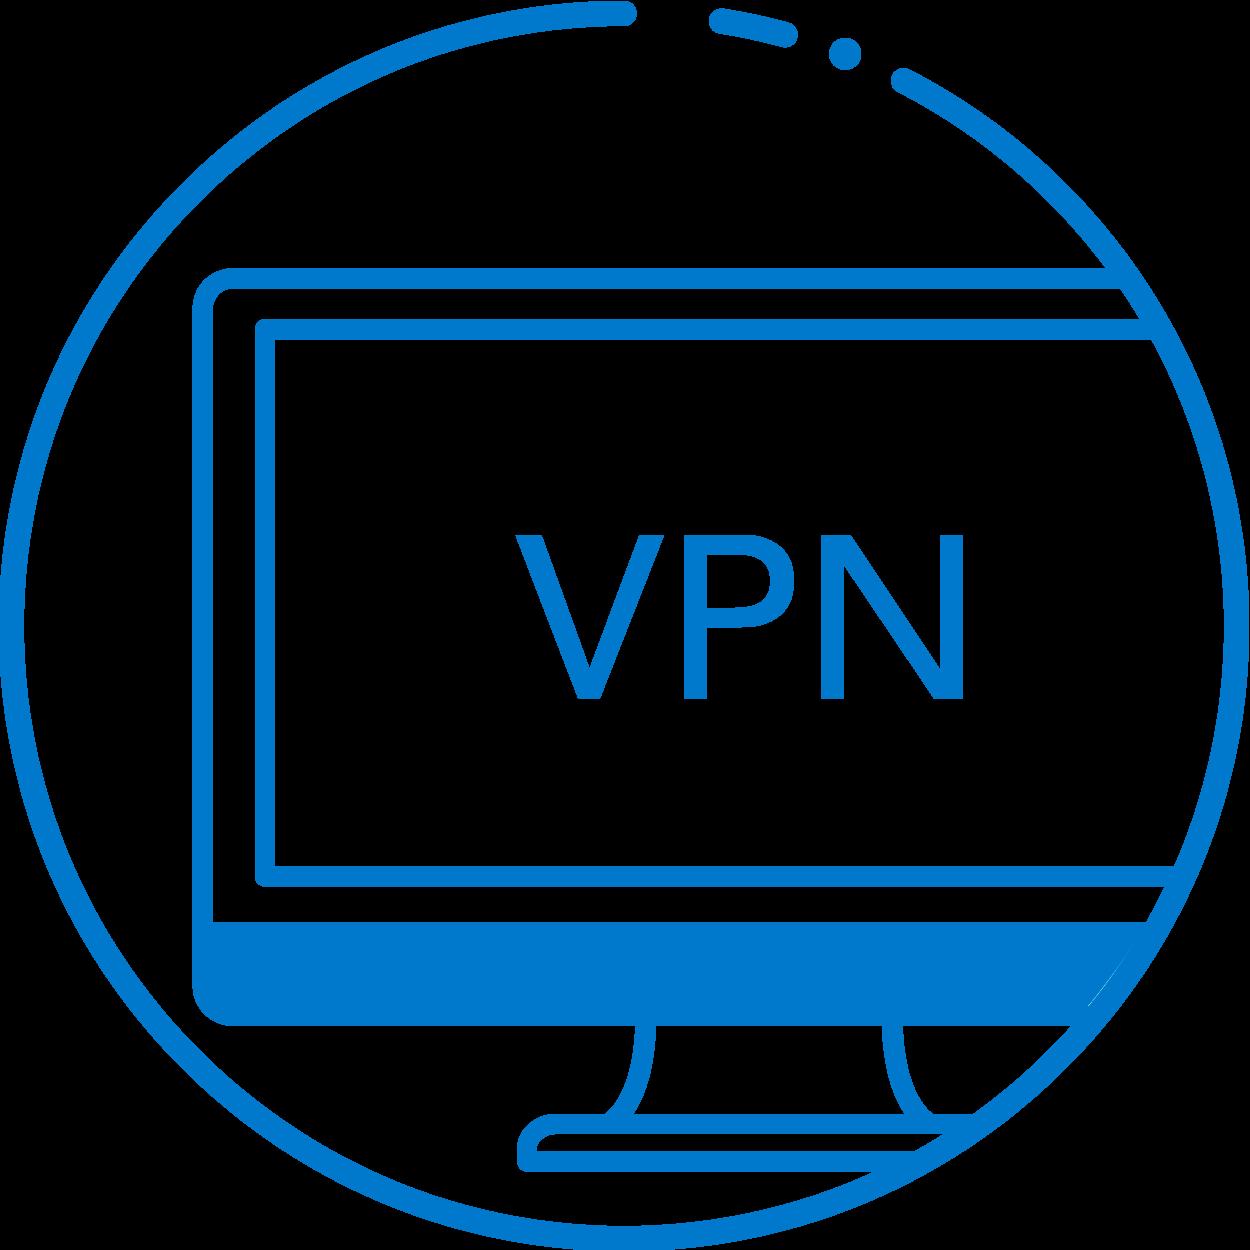 Icono VPN